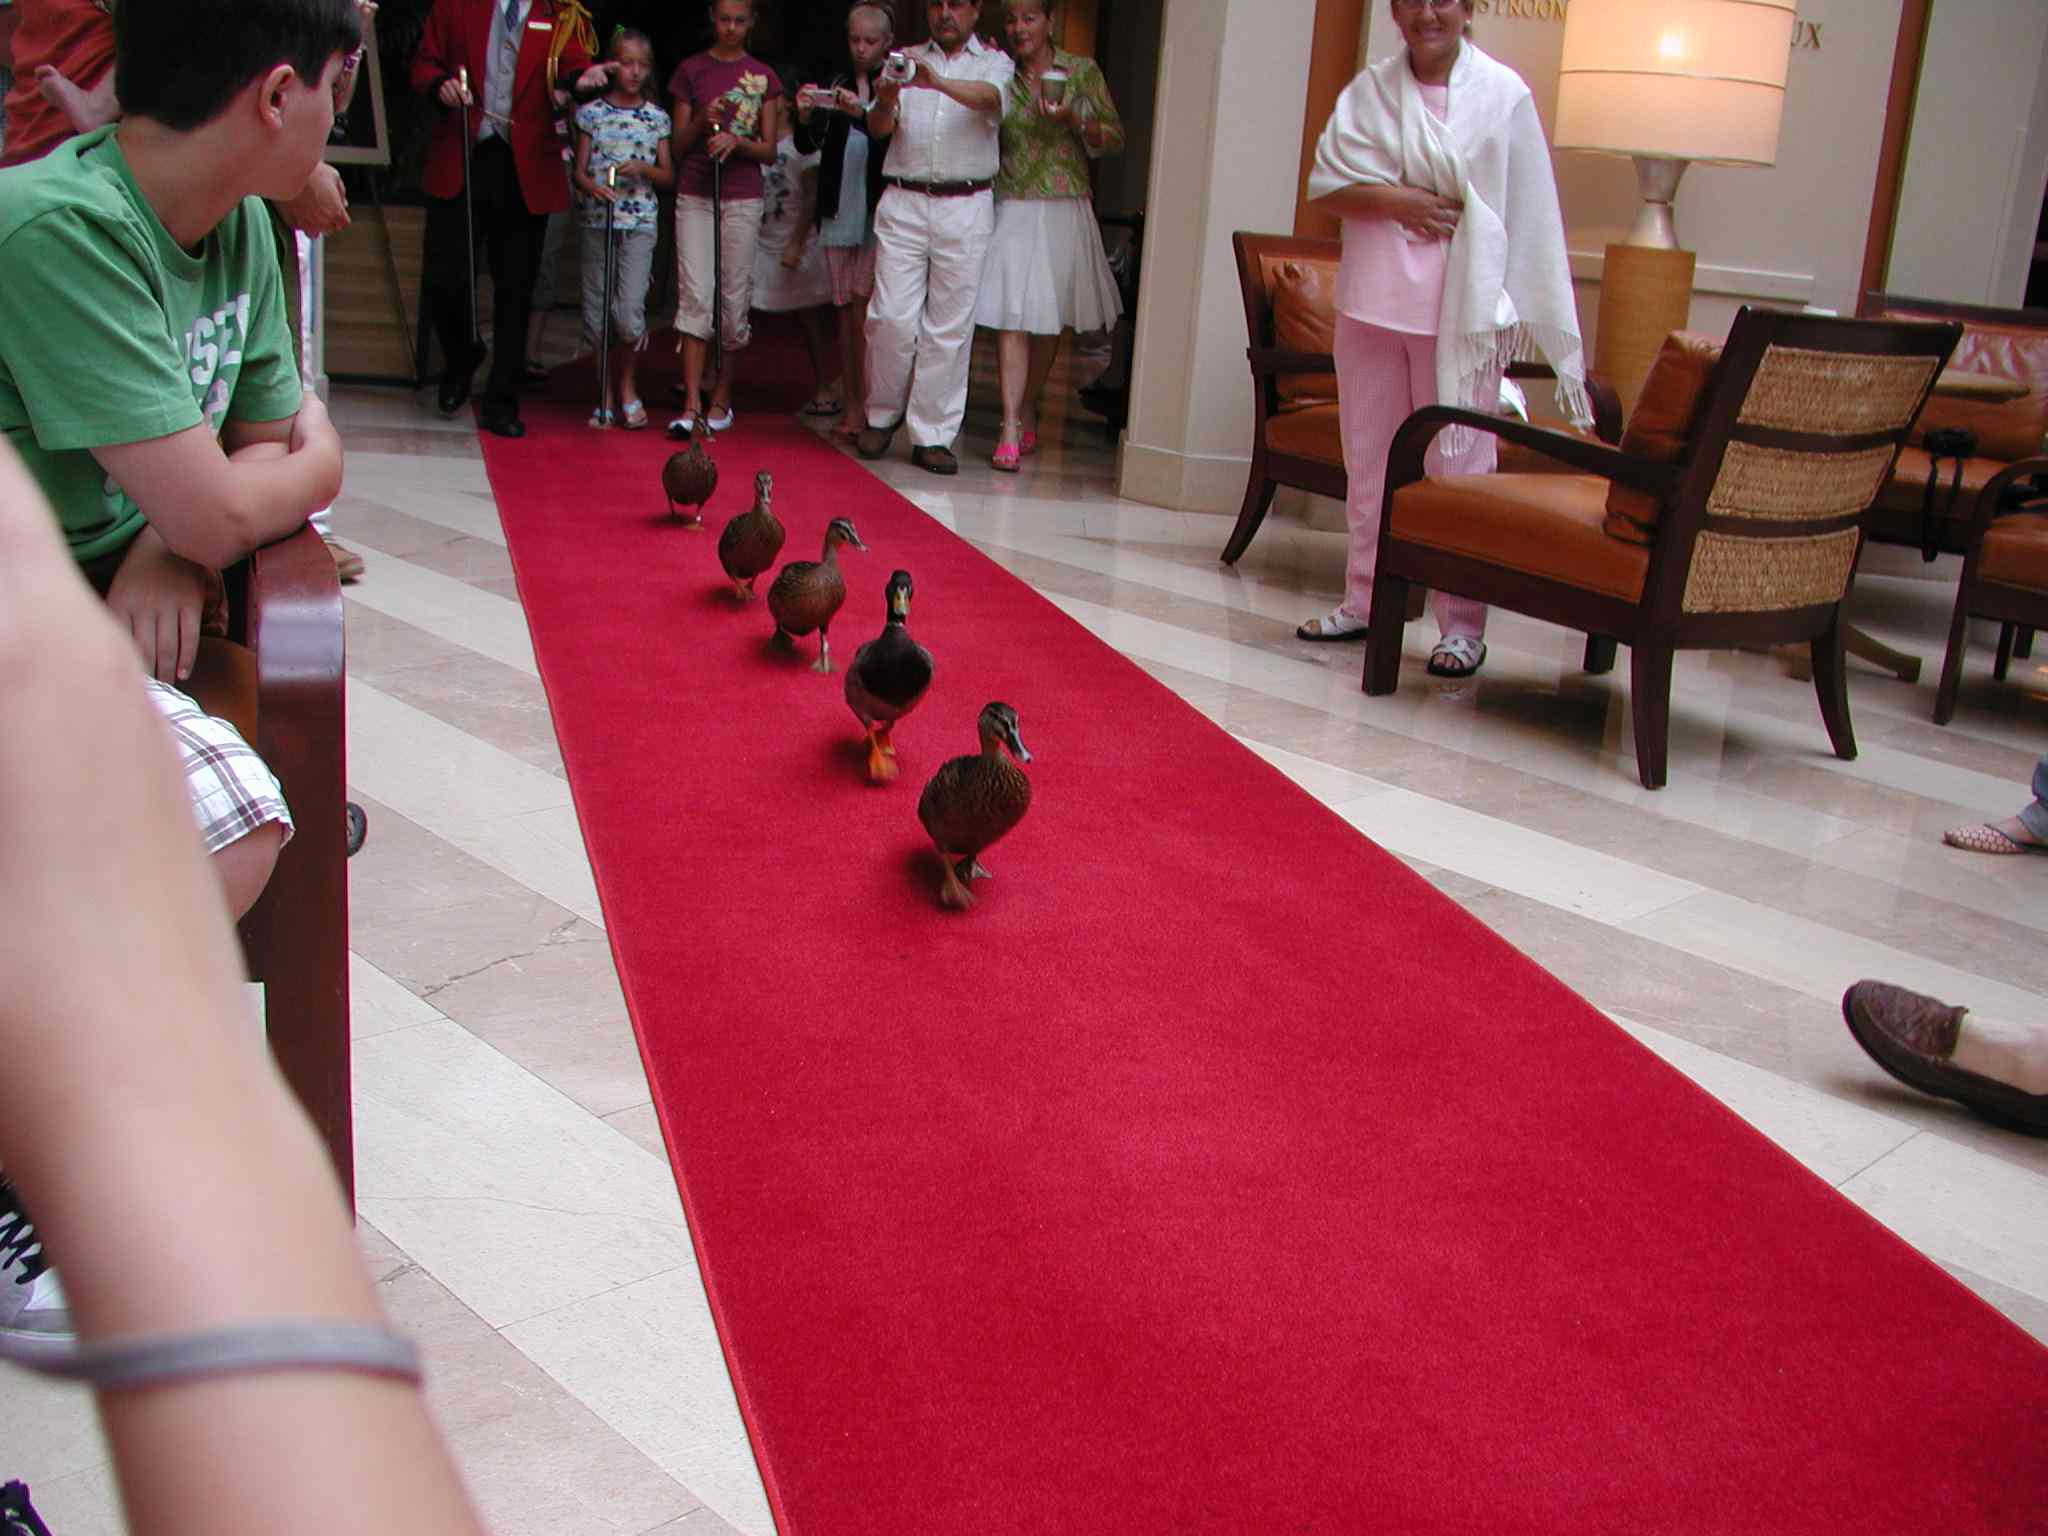 Peabody Ducks March